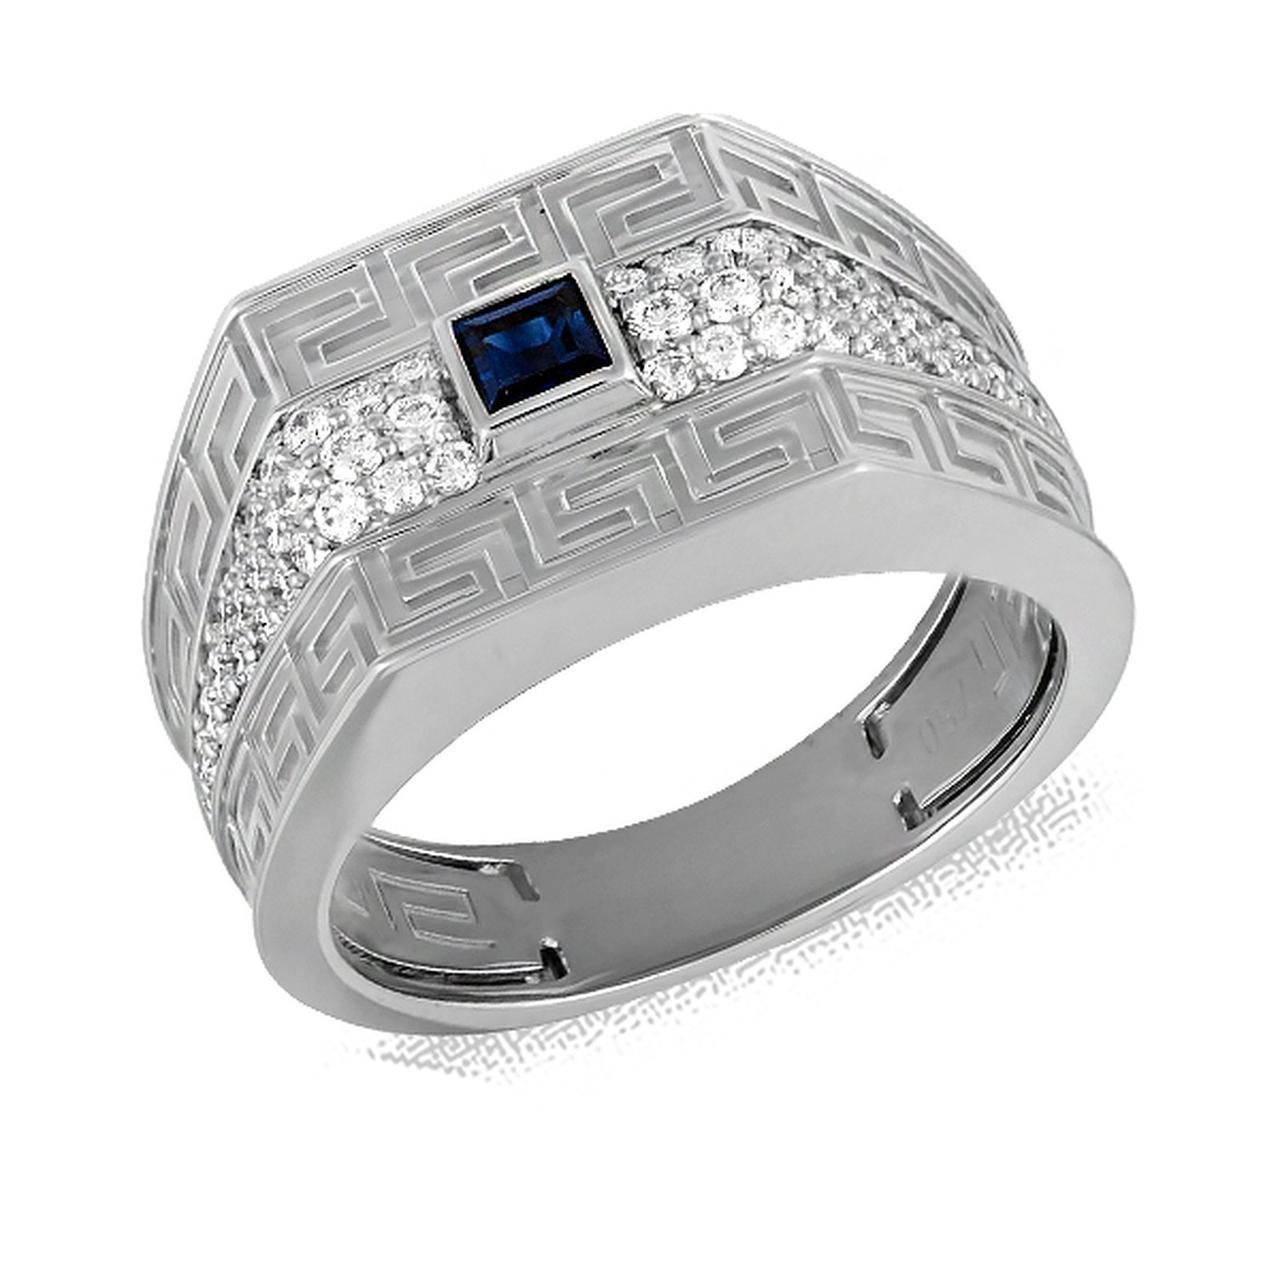 Золотое кольцо с бриллиантами и сапфирами, размер 19.5 (076686)